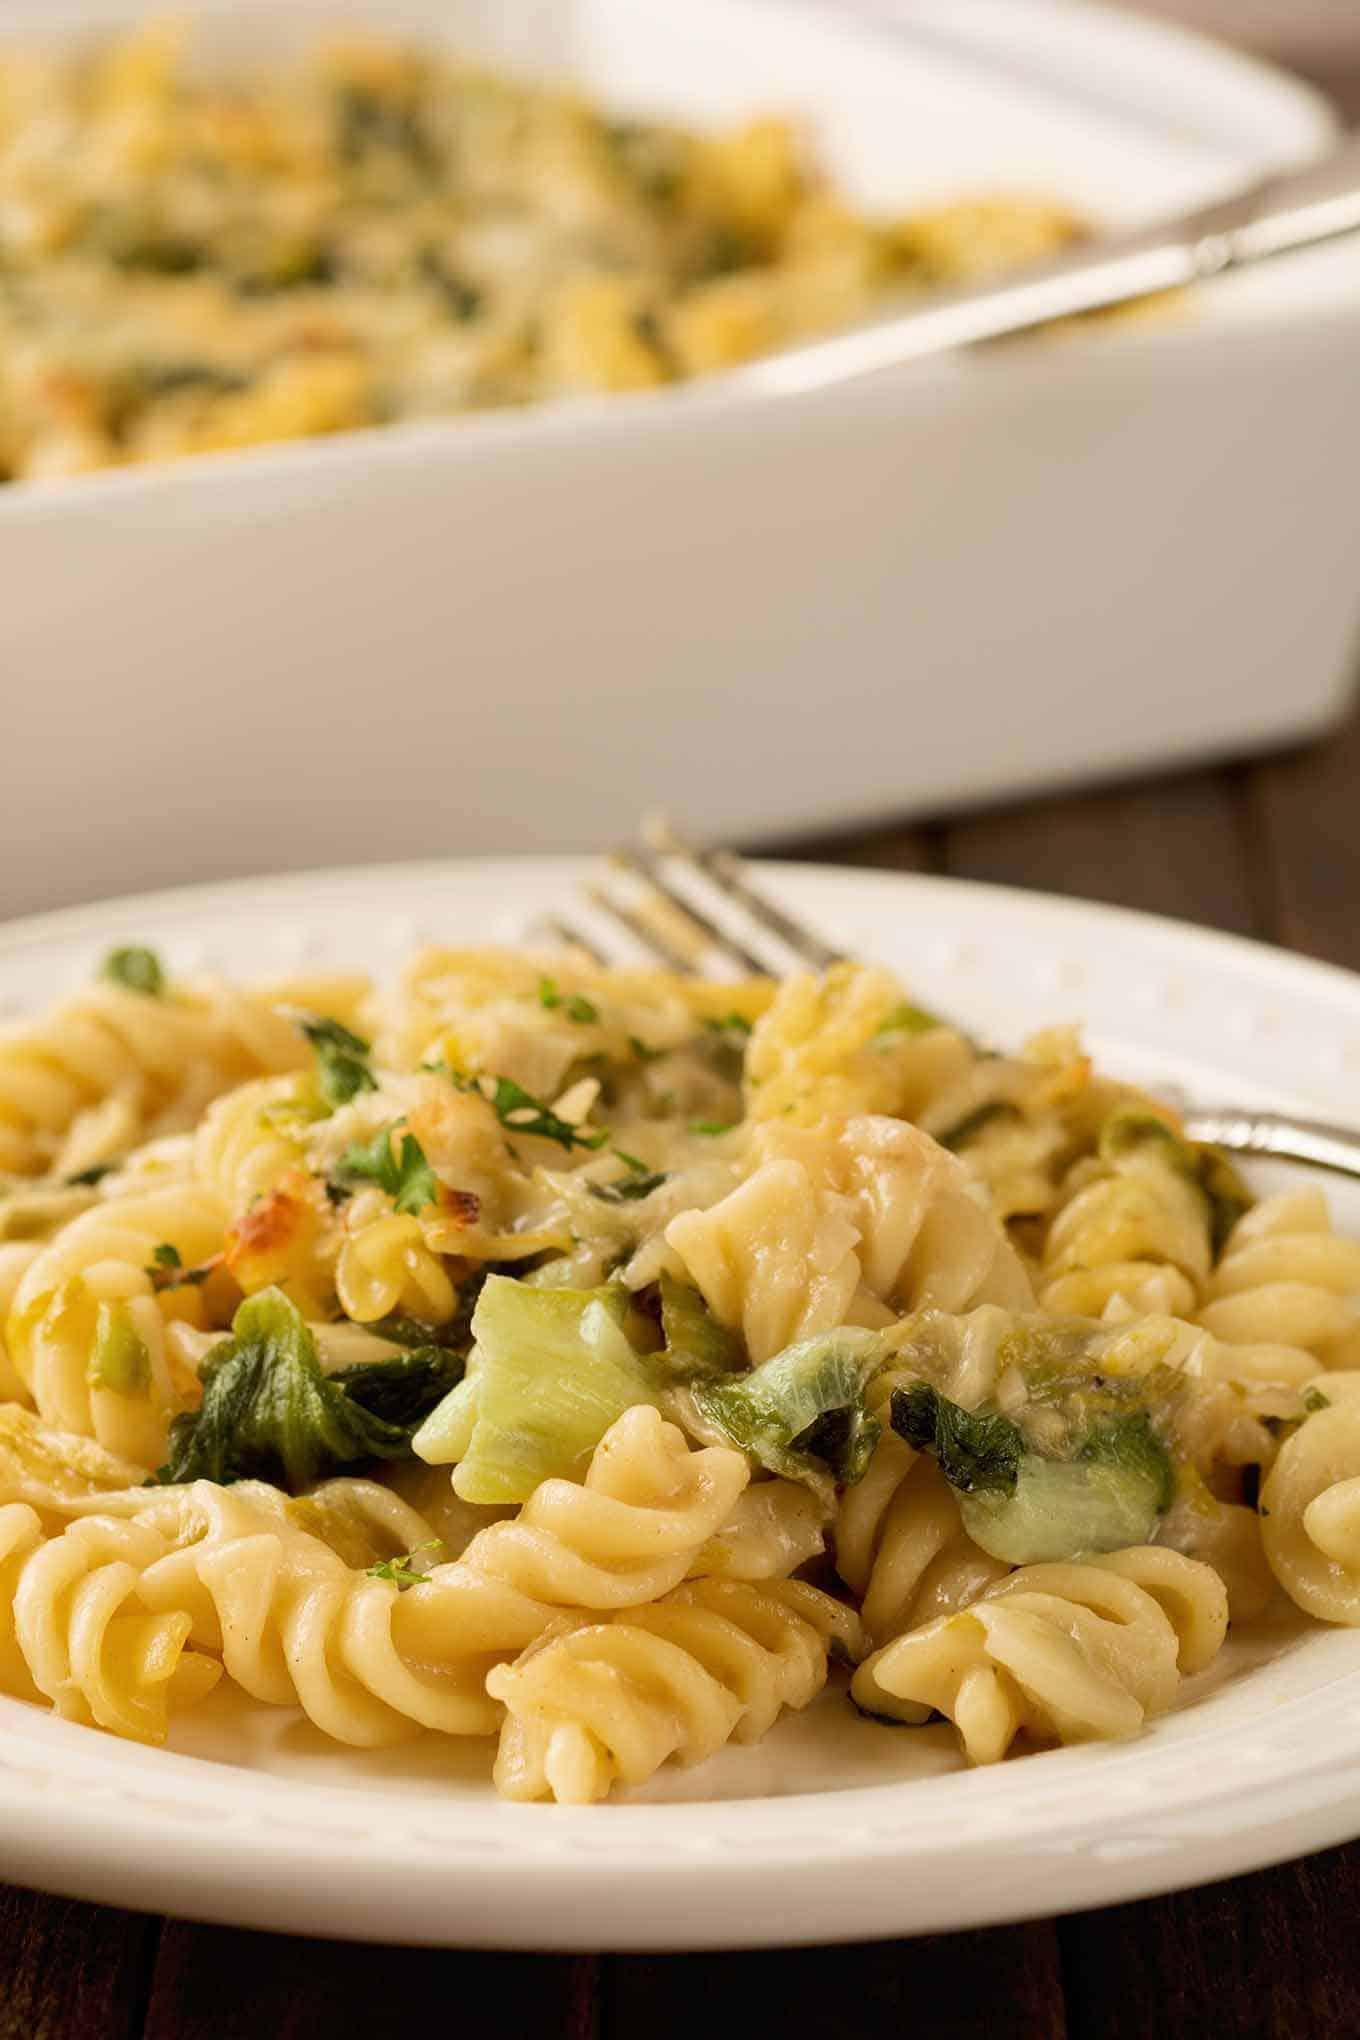 Creamy Parmesan Baked Pasta and Greens Recipe